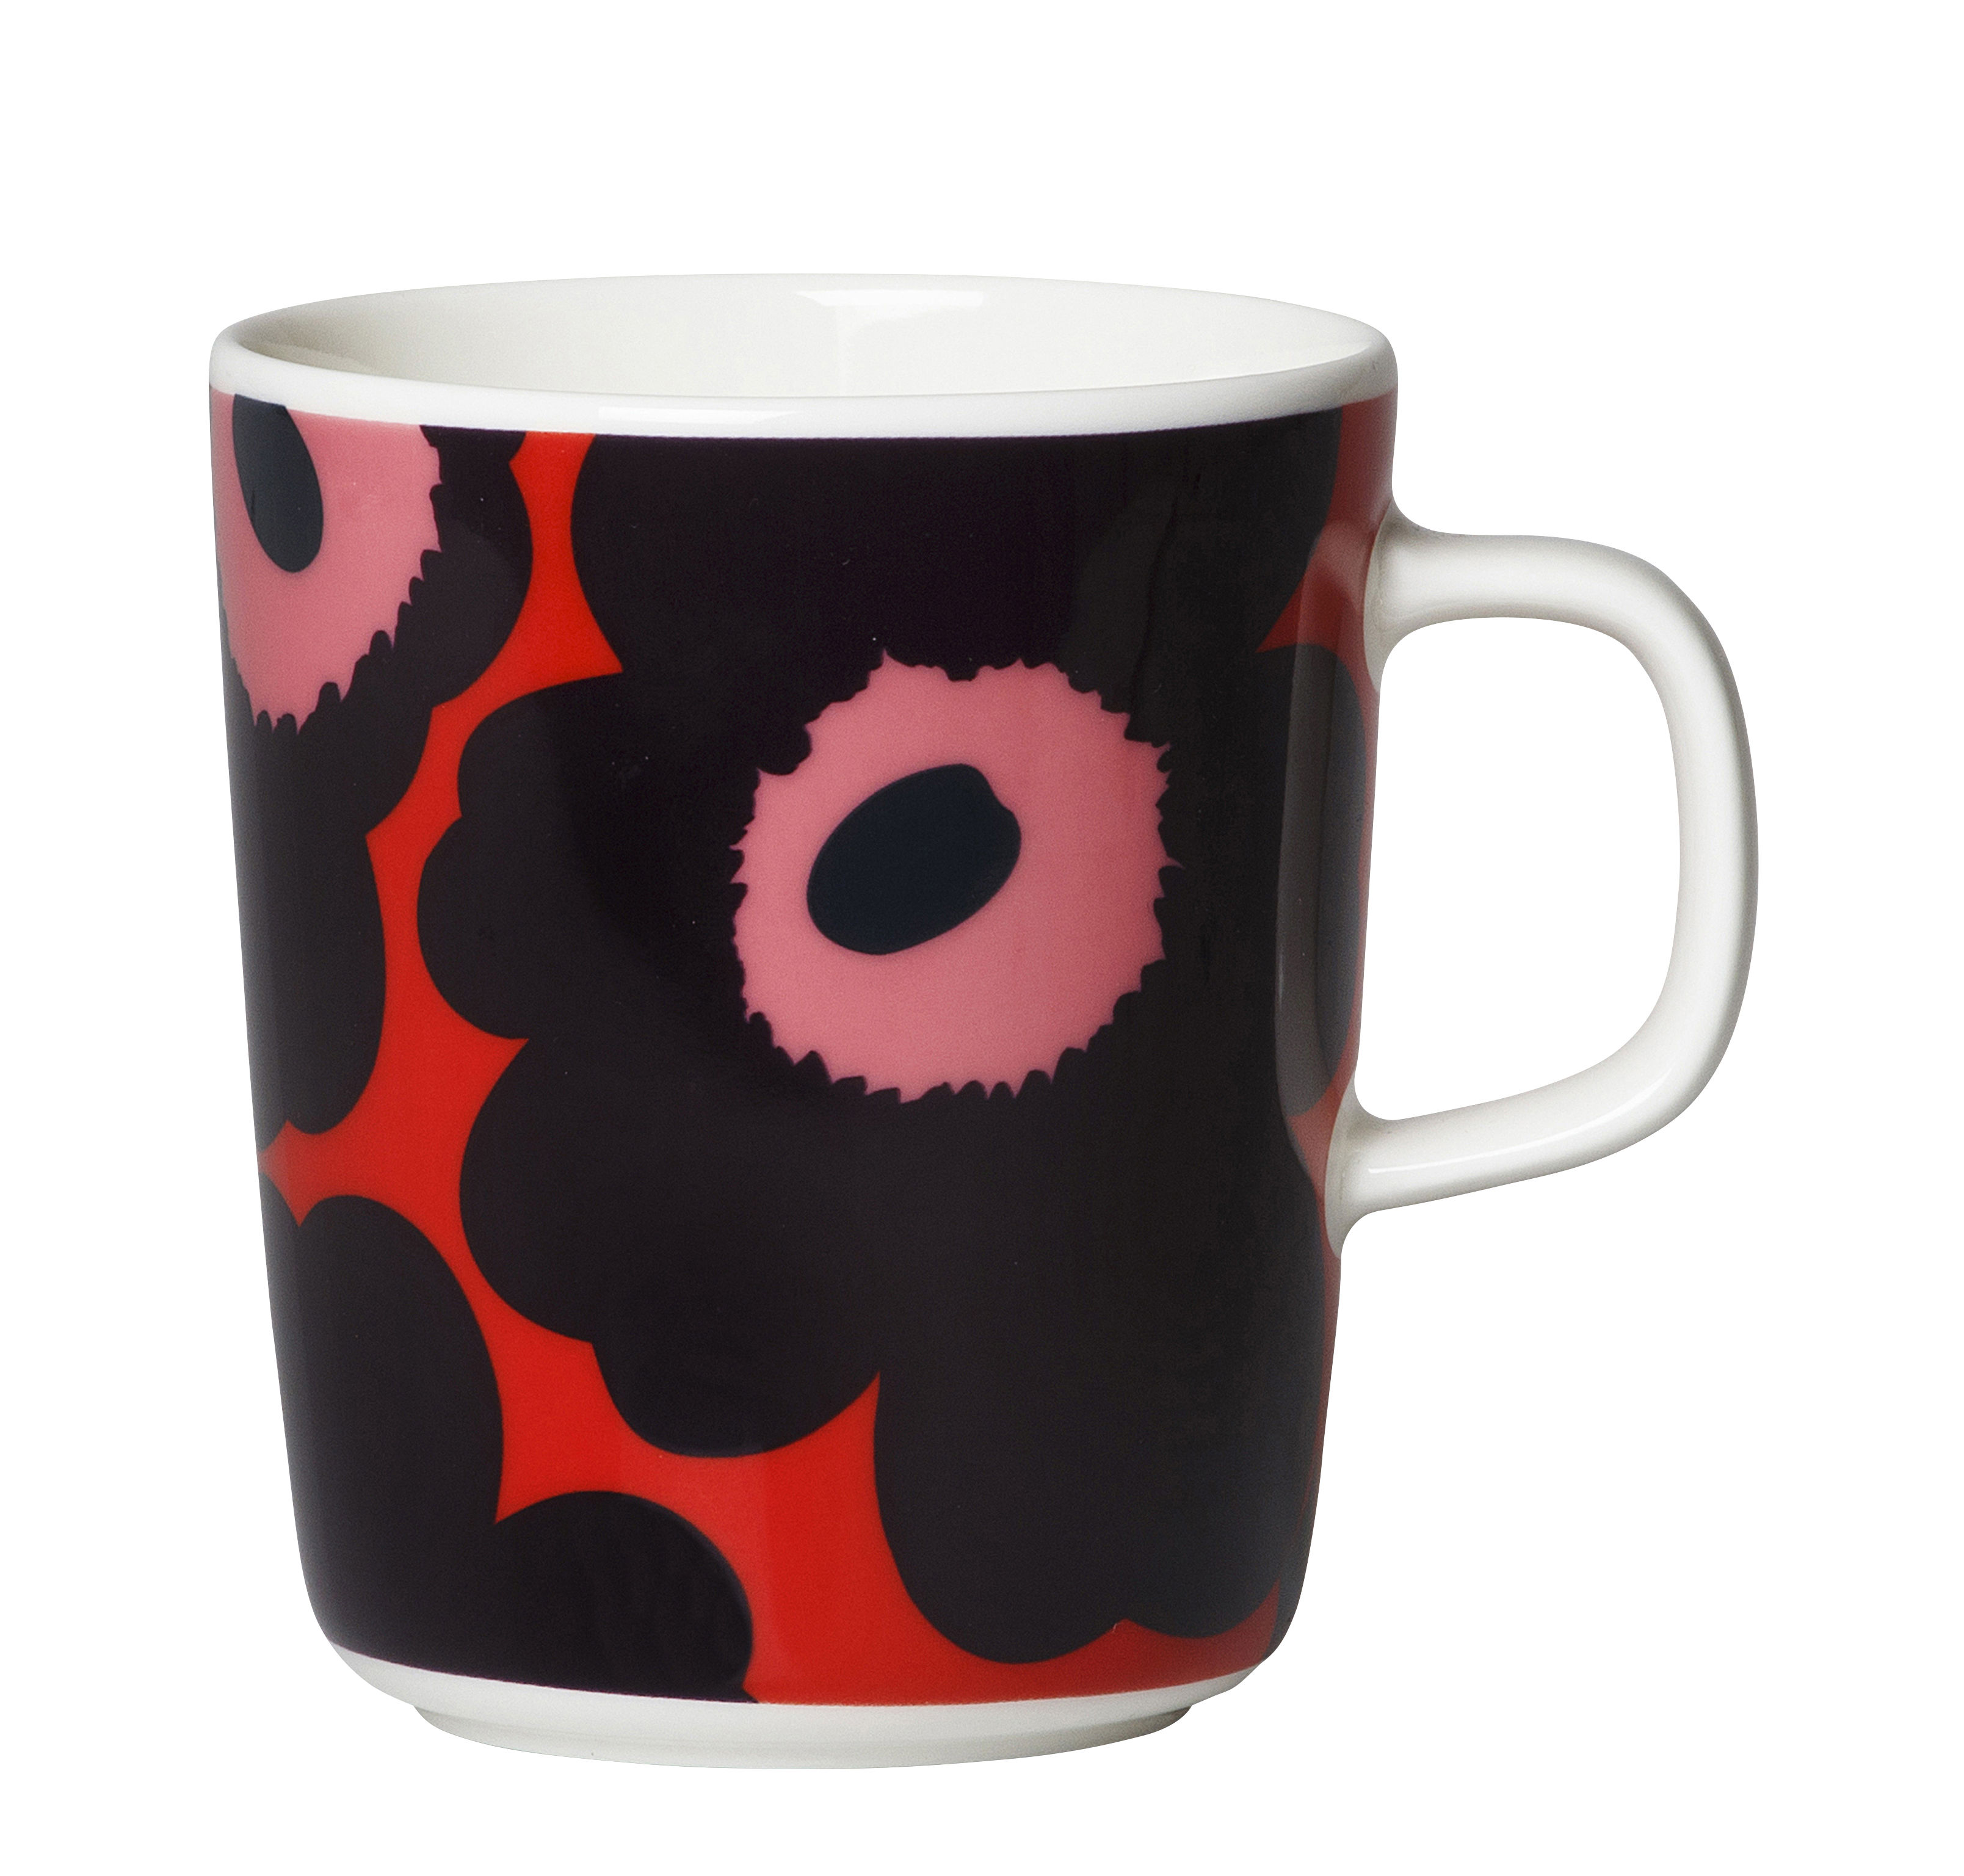 Arts de la table - Tasses et mugs - Mug Unikko / 25 cl - Marimekko - Unikko / Rouge, violet - Grès